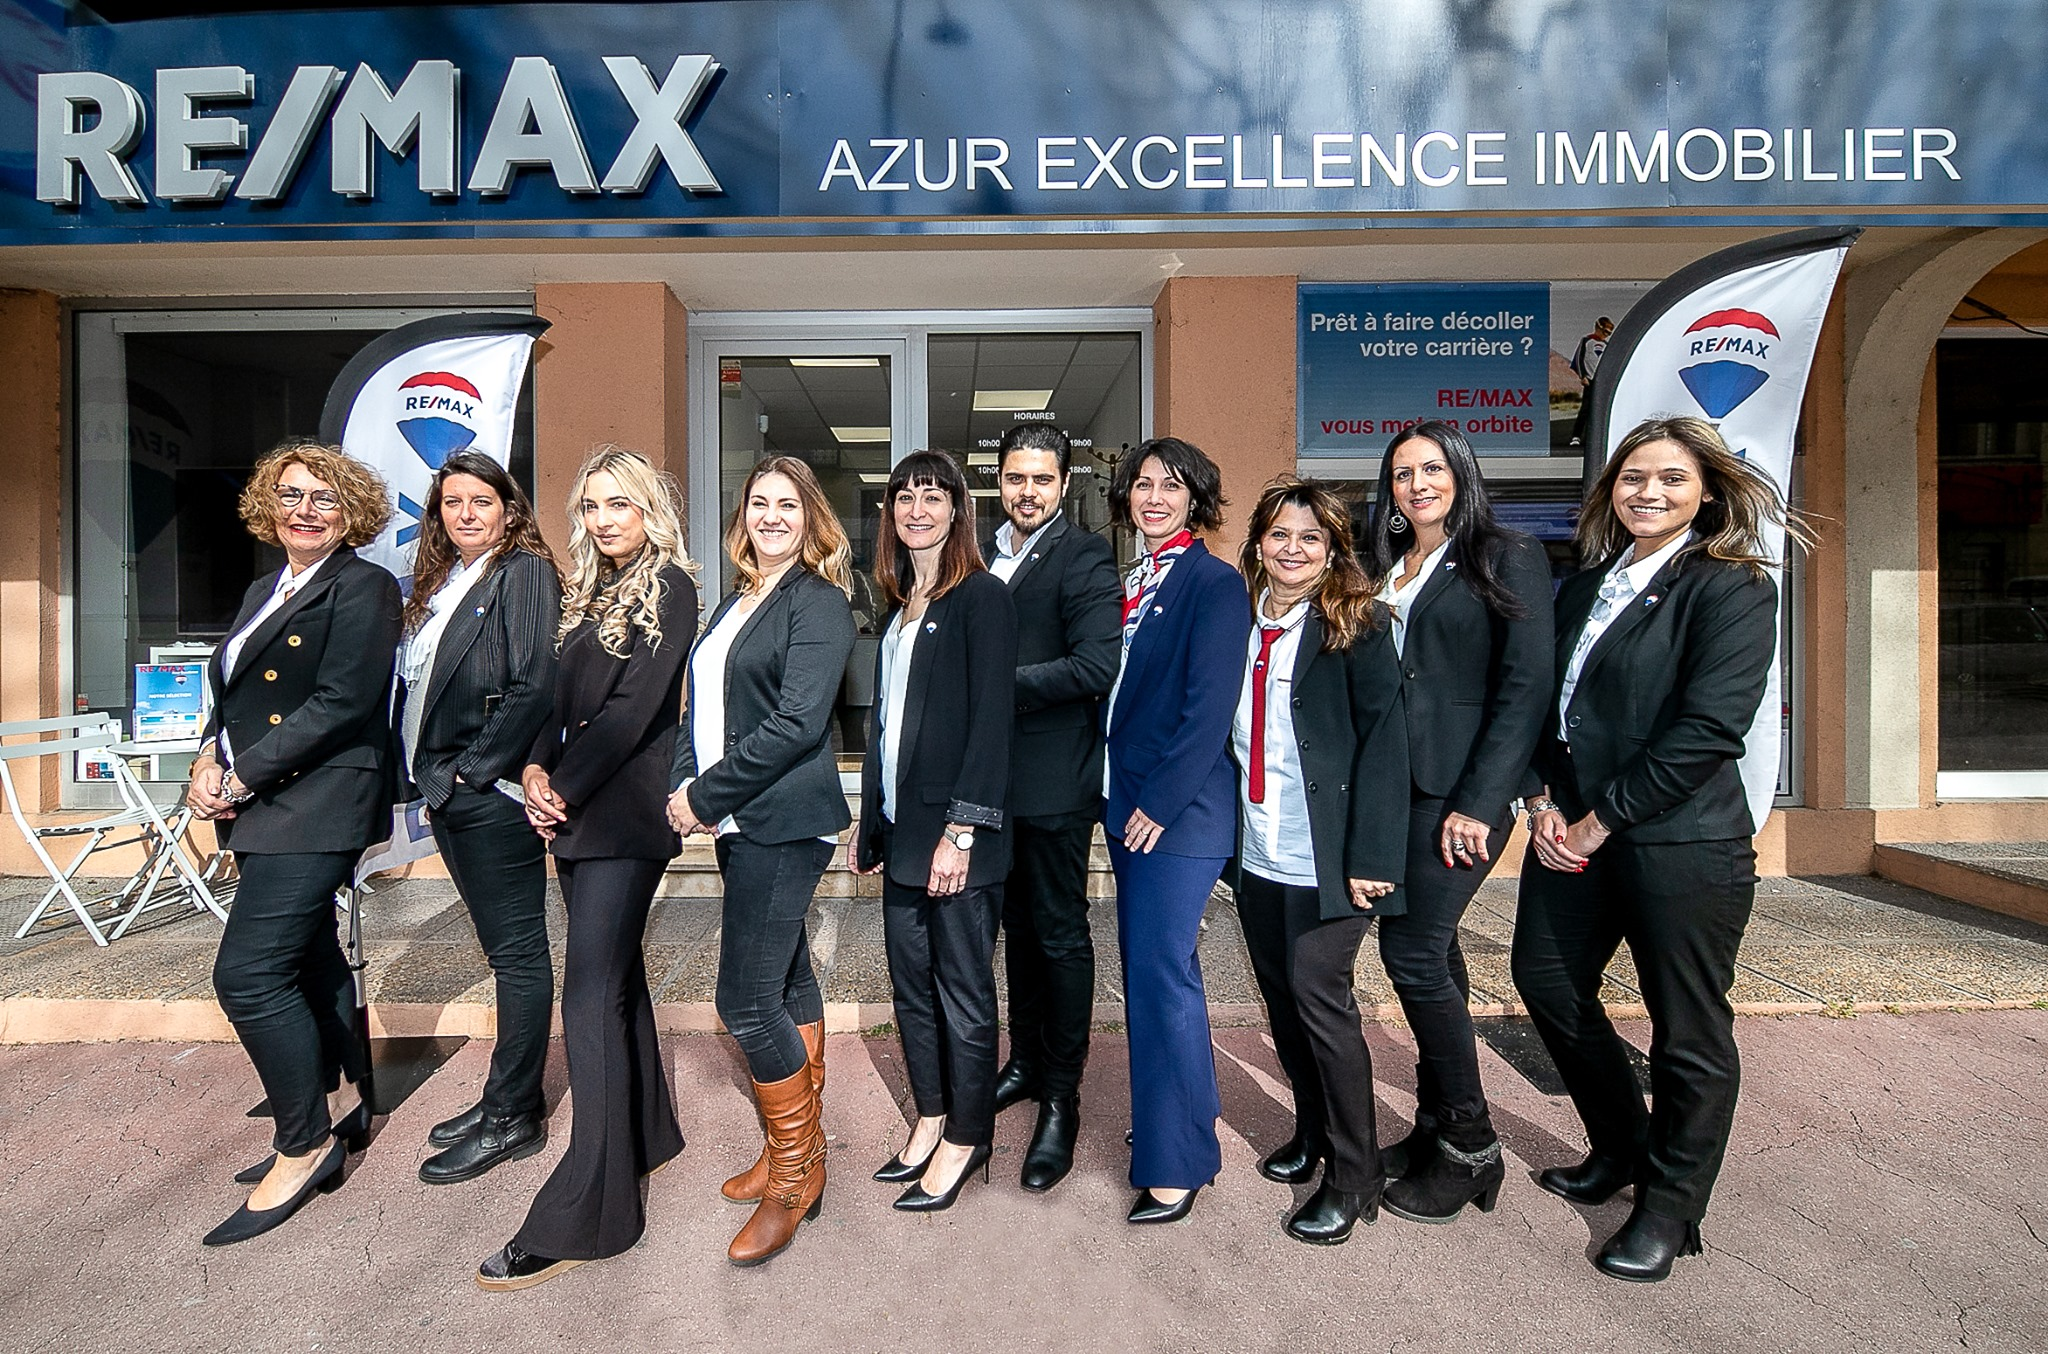 REMAX Azur Excellence